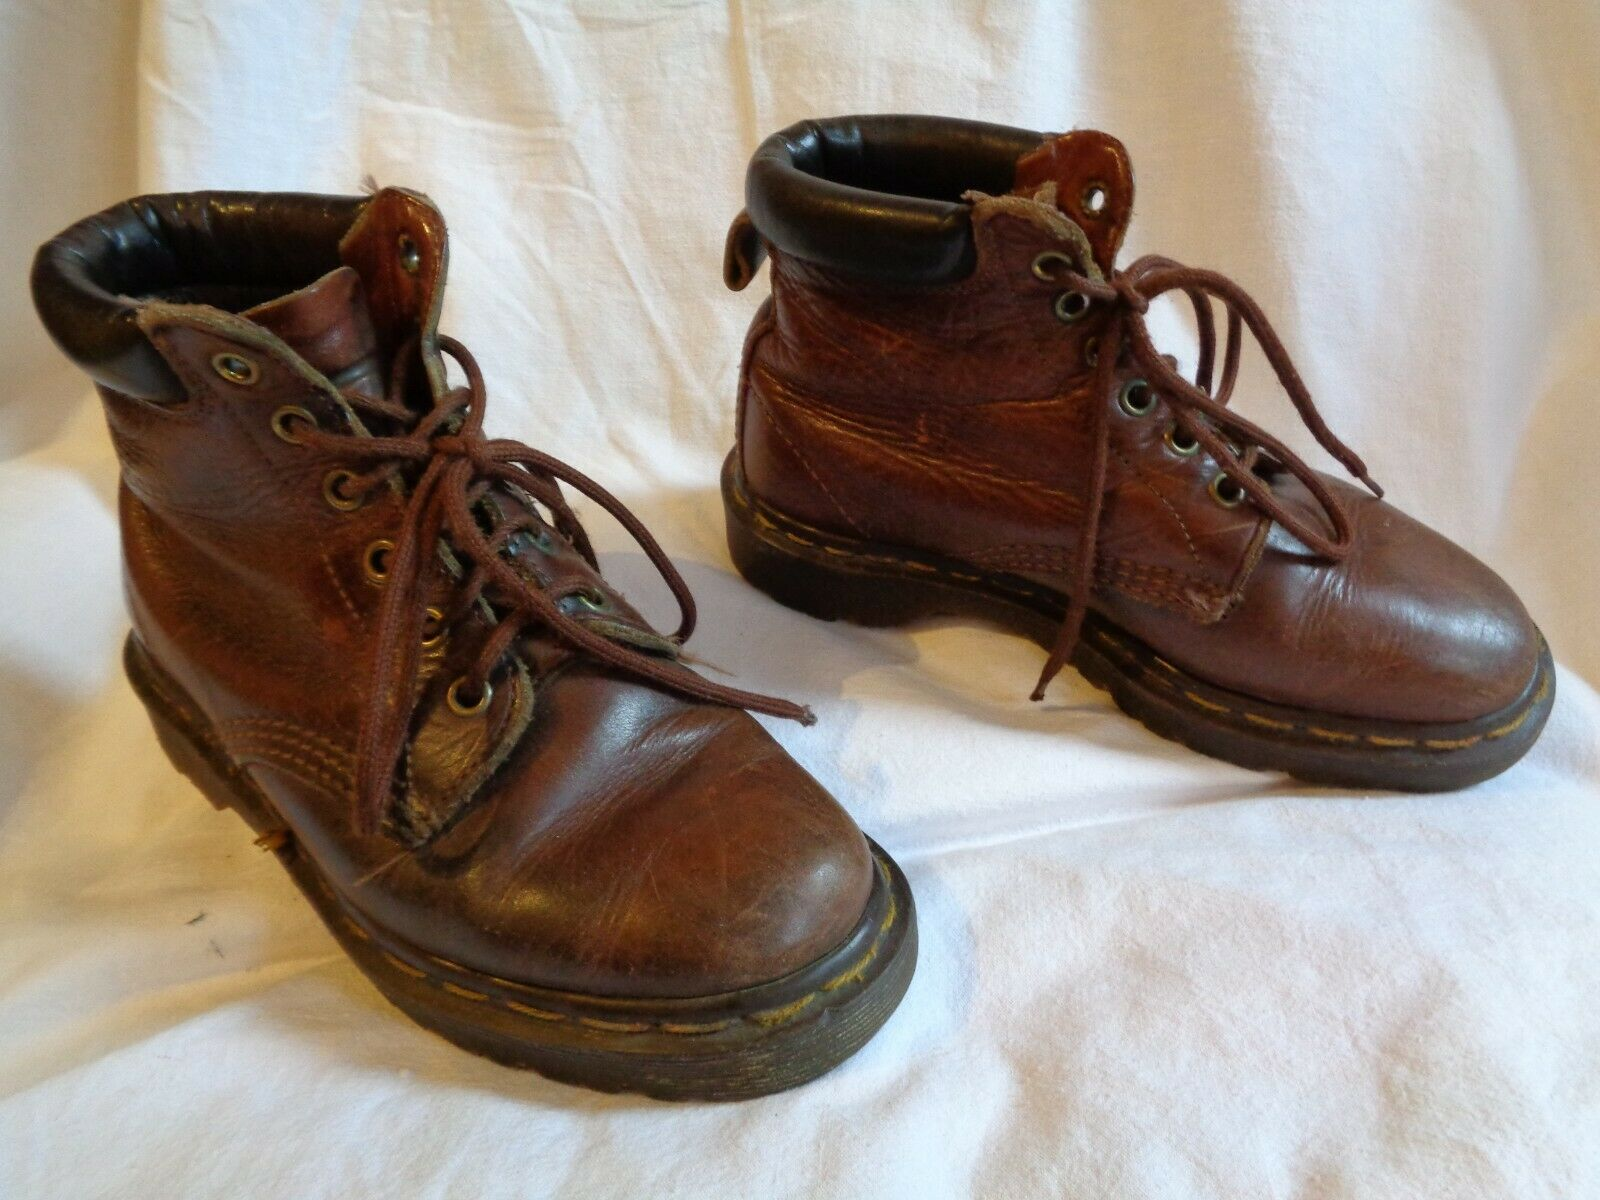 Dr. Martens Stiefelette Stiefel Stiefel Leder braun Gr.36 Nr26 unisex Docs cuir 36